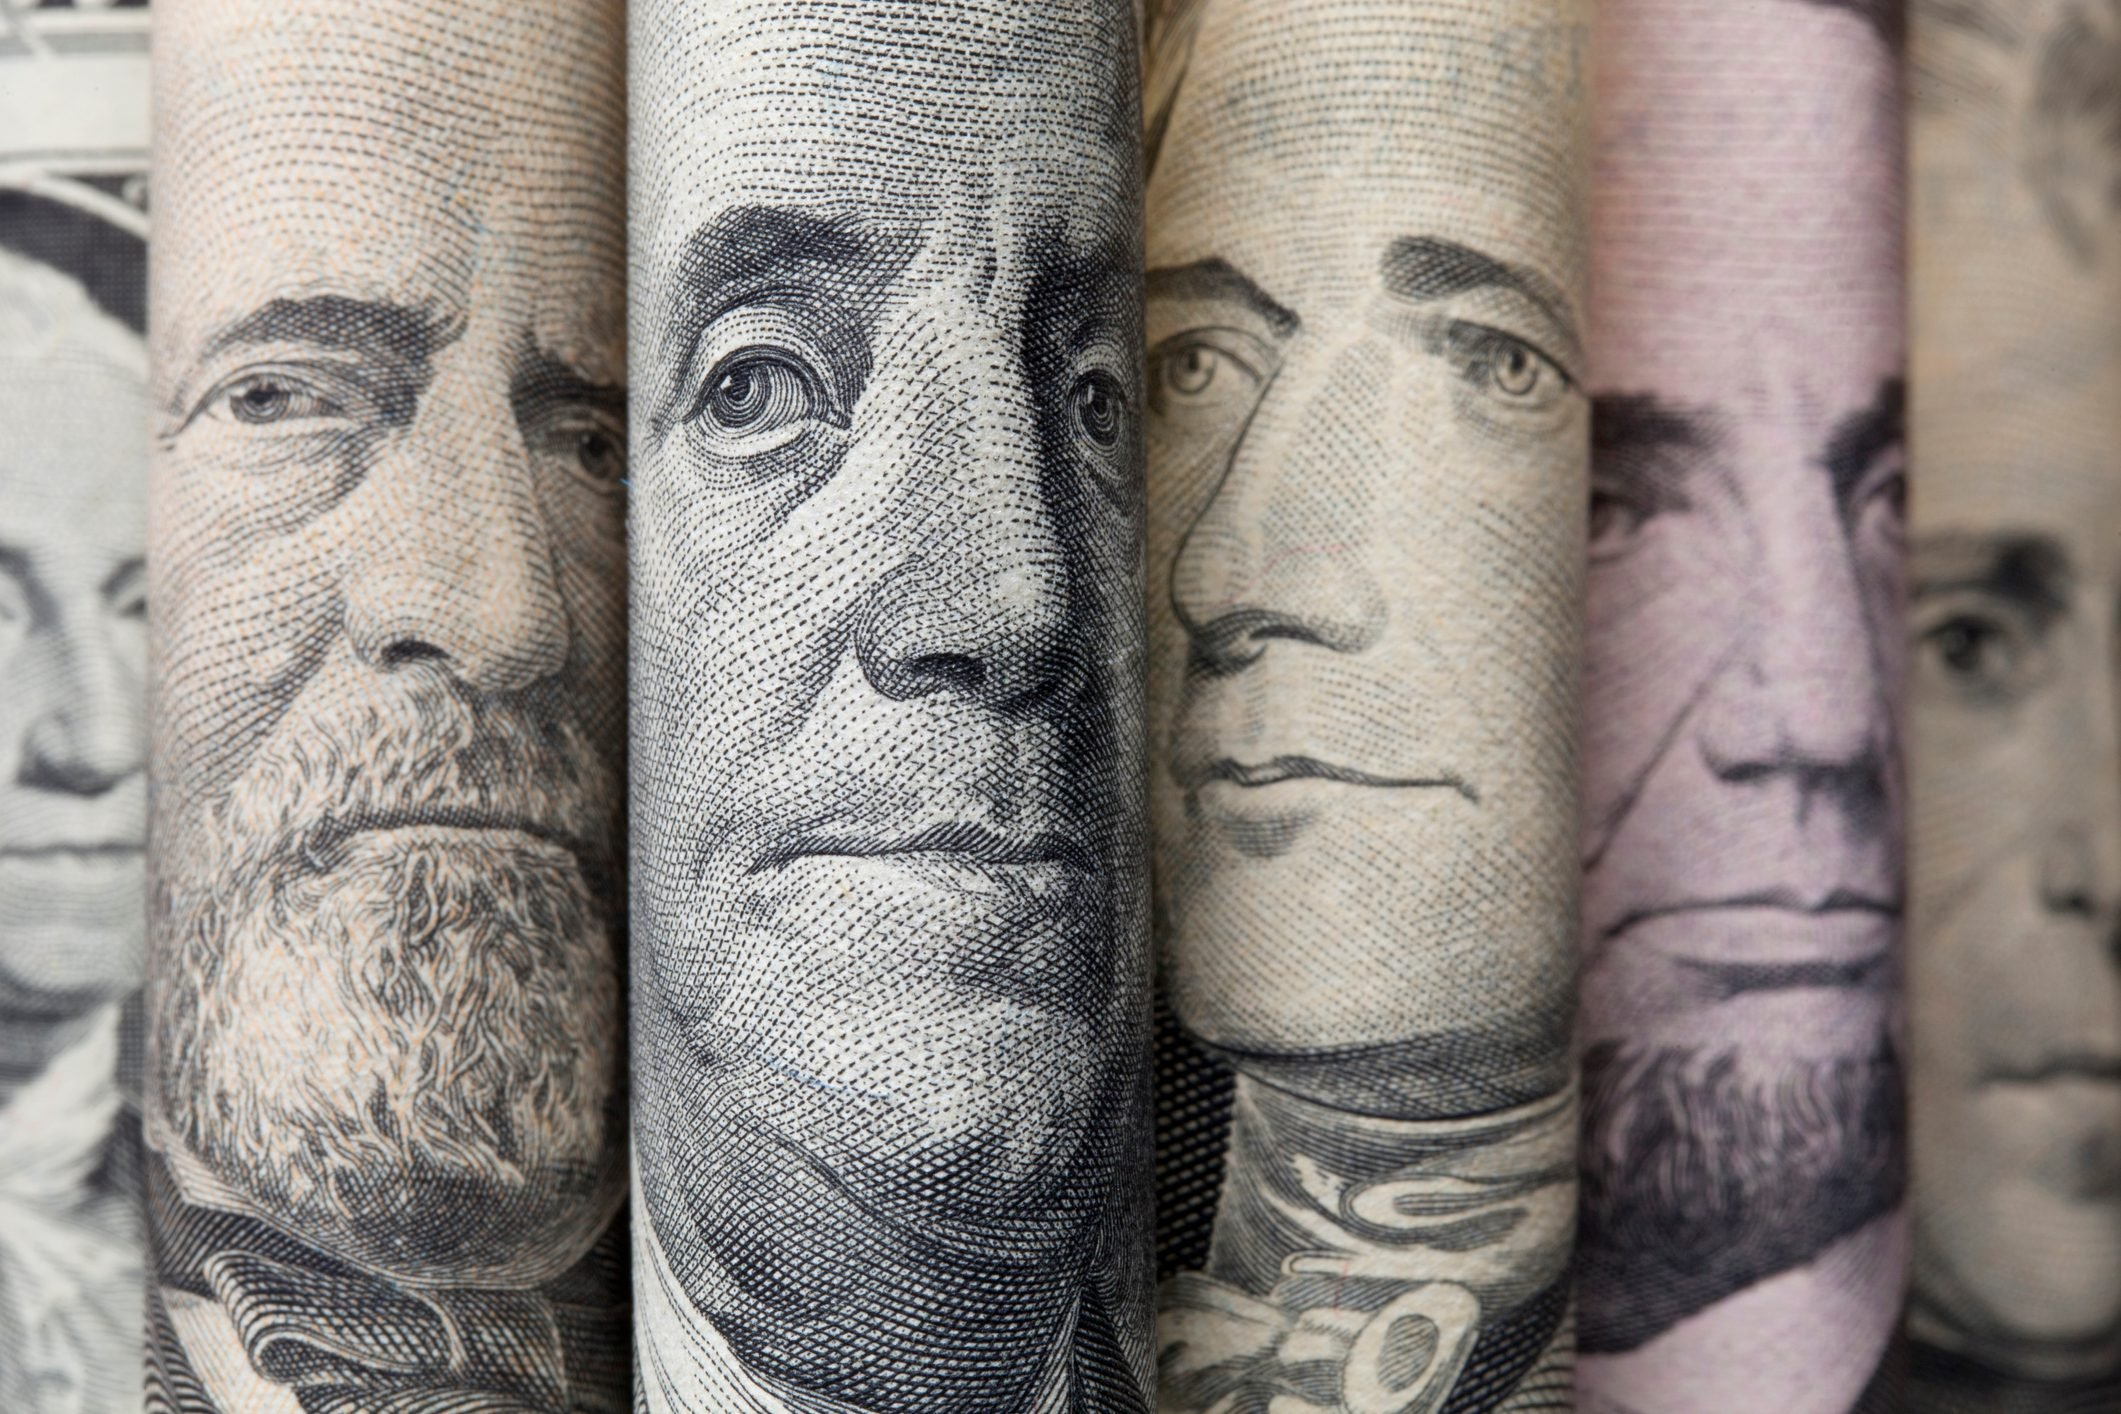 Portraits of U.S. presidents on dollar bills